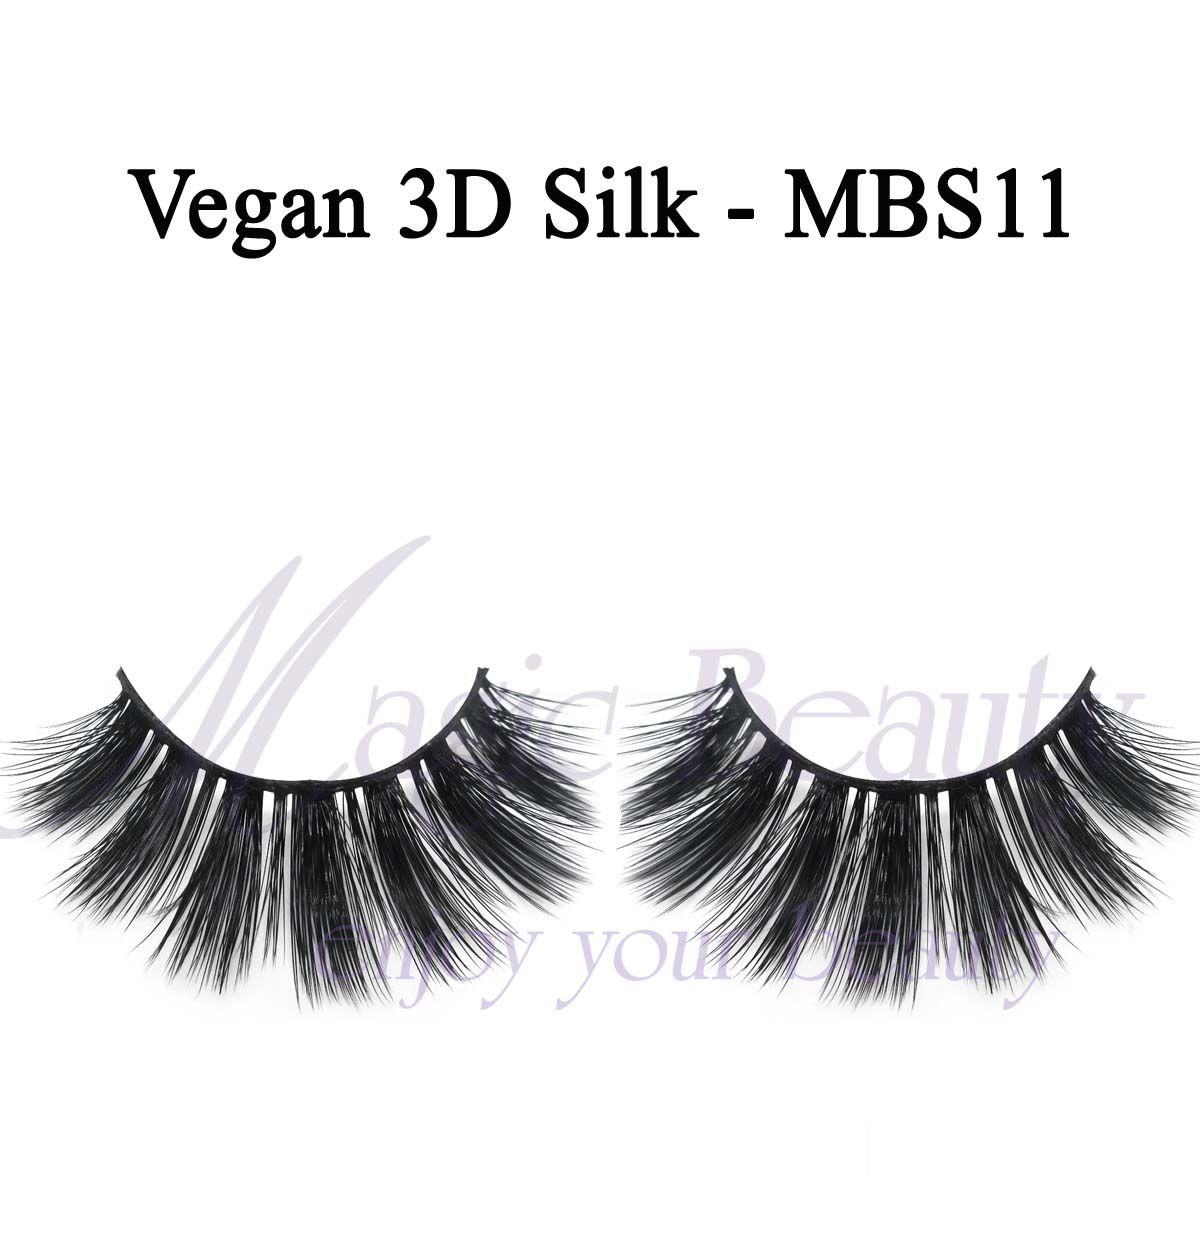 Vegan 3D Silk Lashes-MBS11 Made of Korean PBT Fiber and